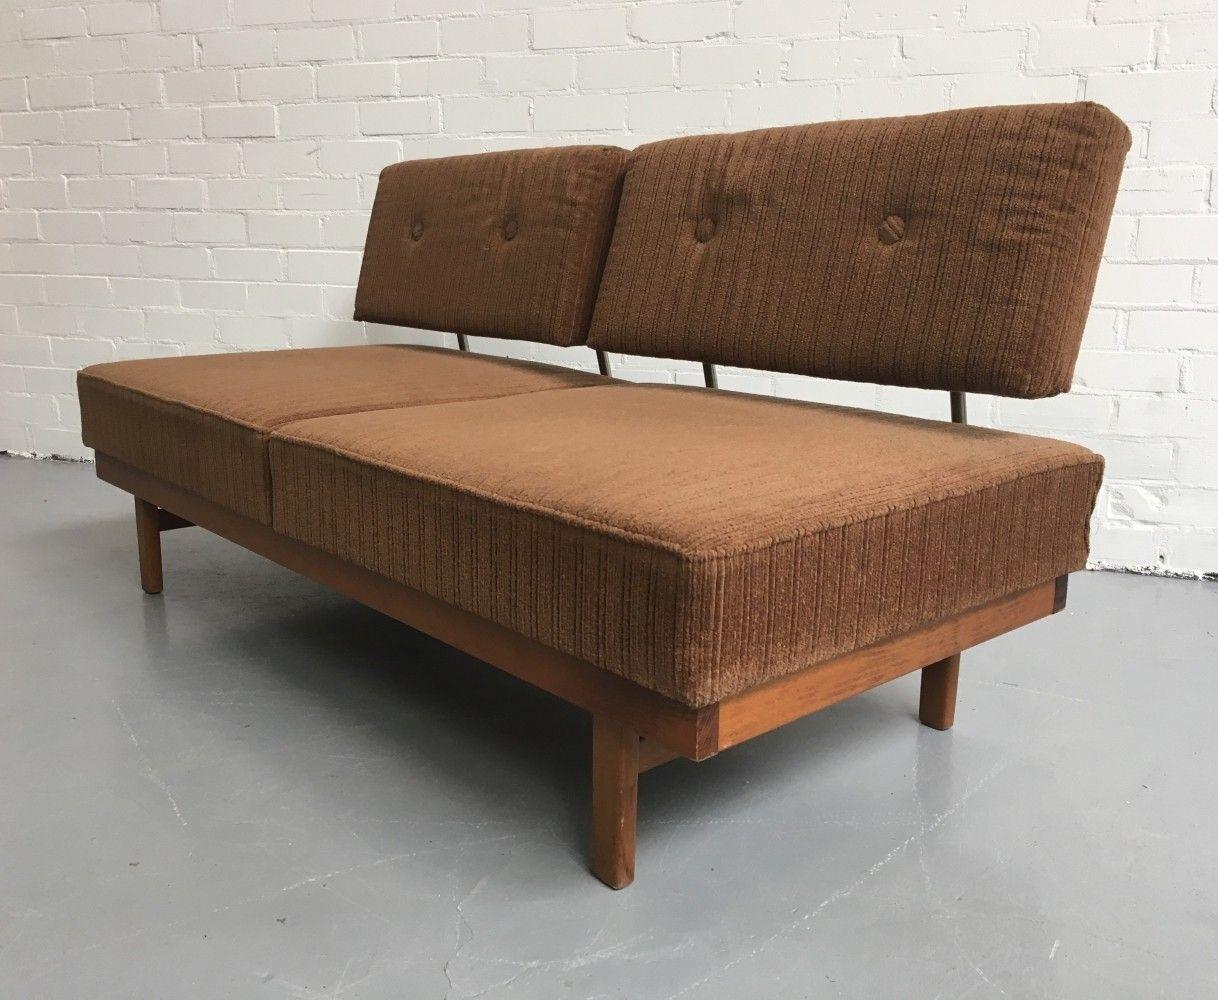 1950s hallway ideas  Stella sleeping sofa by Walter Knoll s  Vintage Design Seating